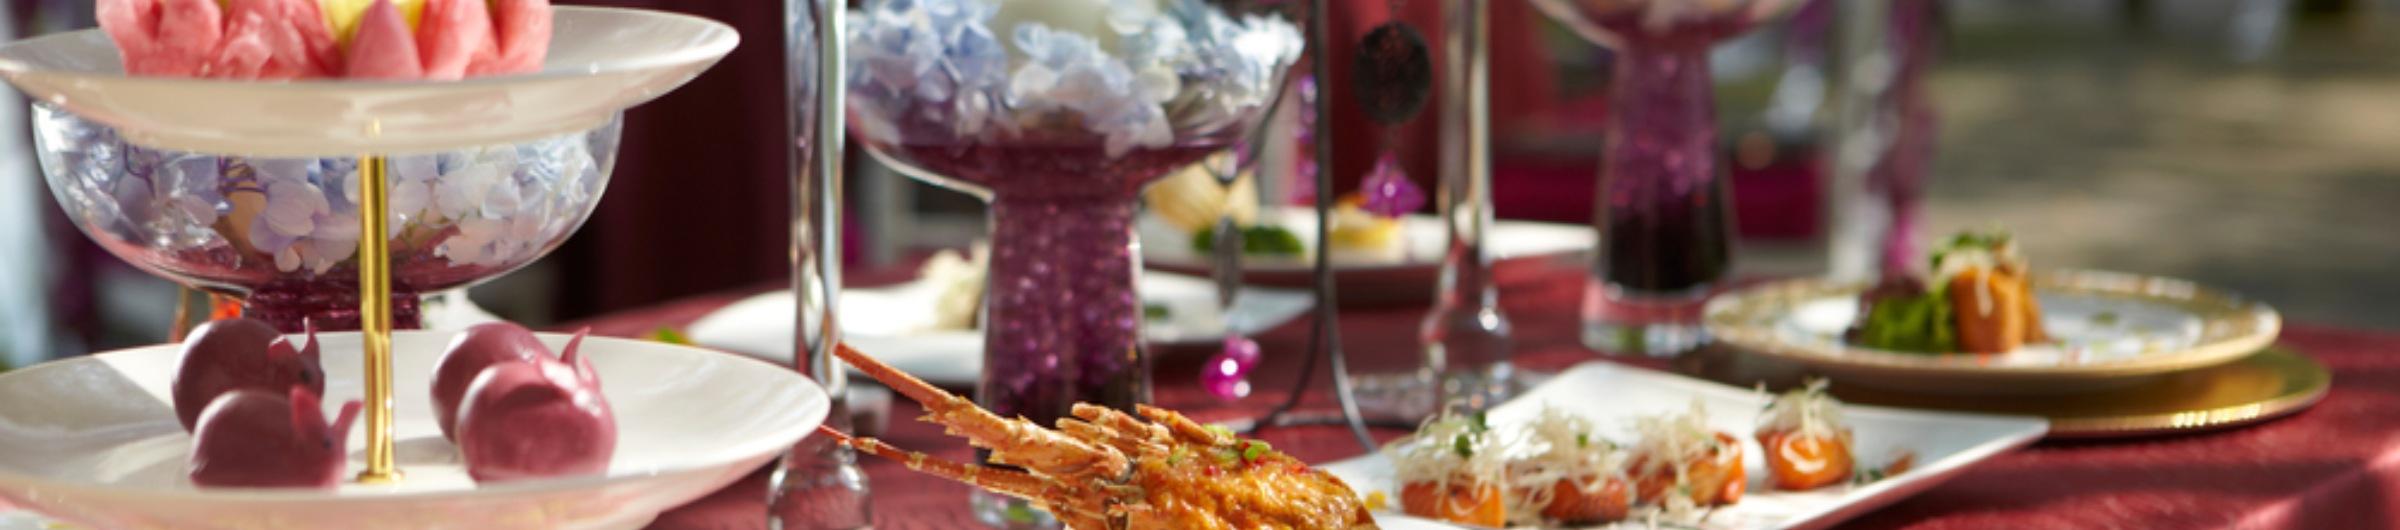 Lobster dish set on fancy table outside in gardens